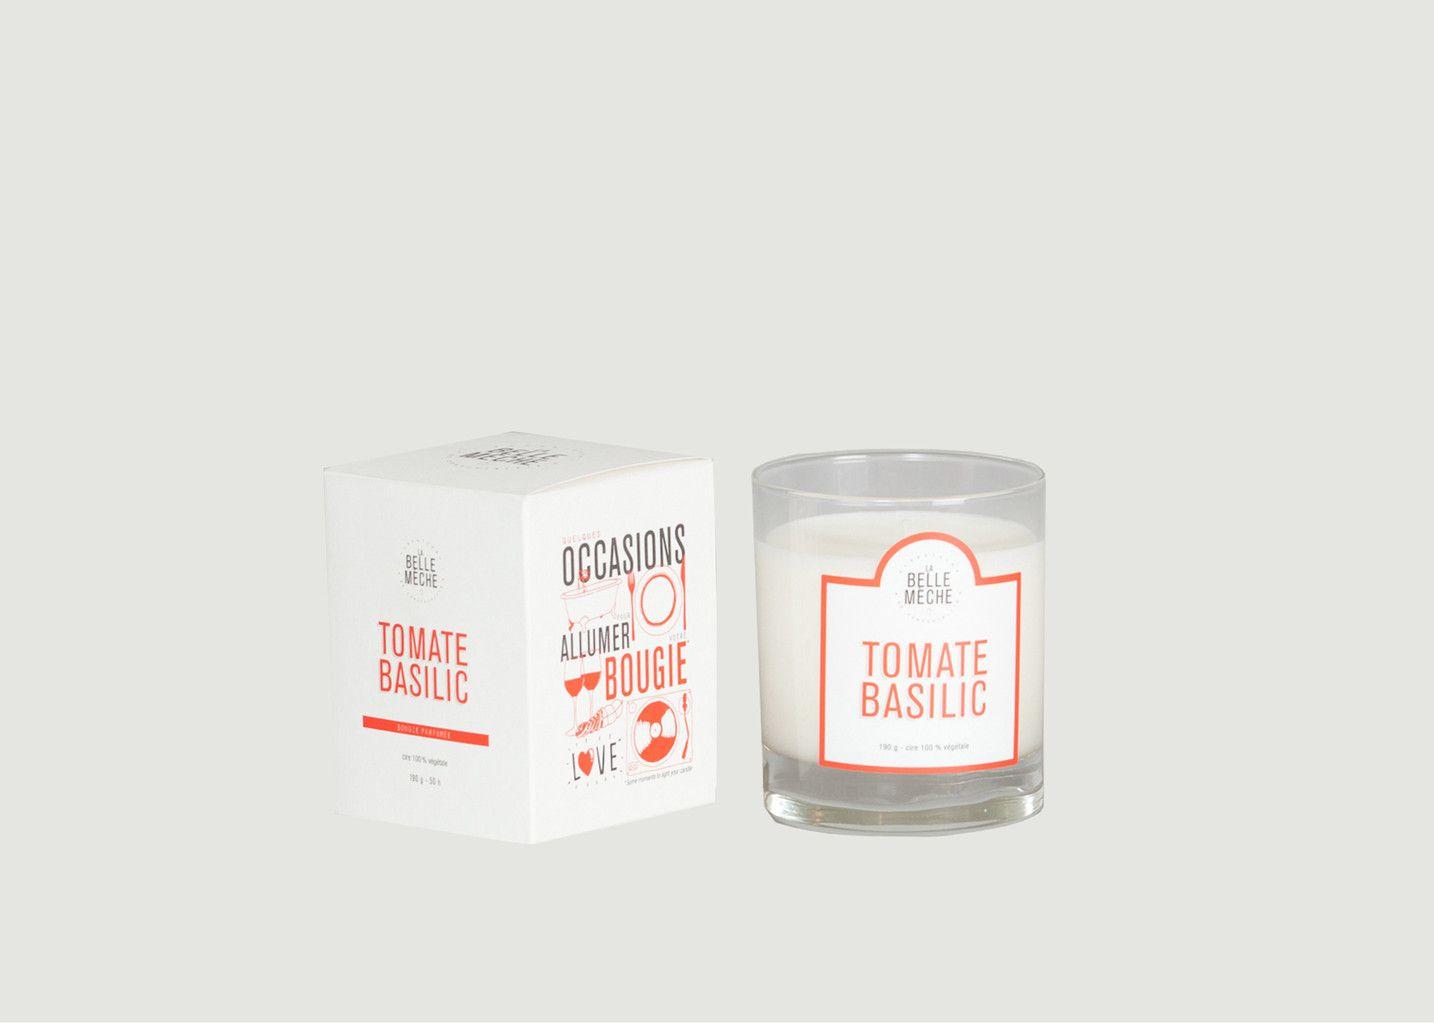 Bougie Tomate Basilic - La Belle Mèche